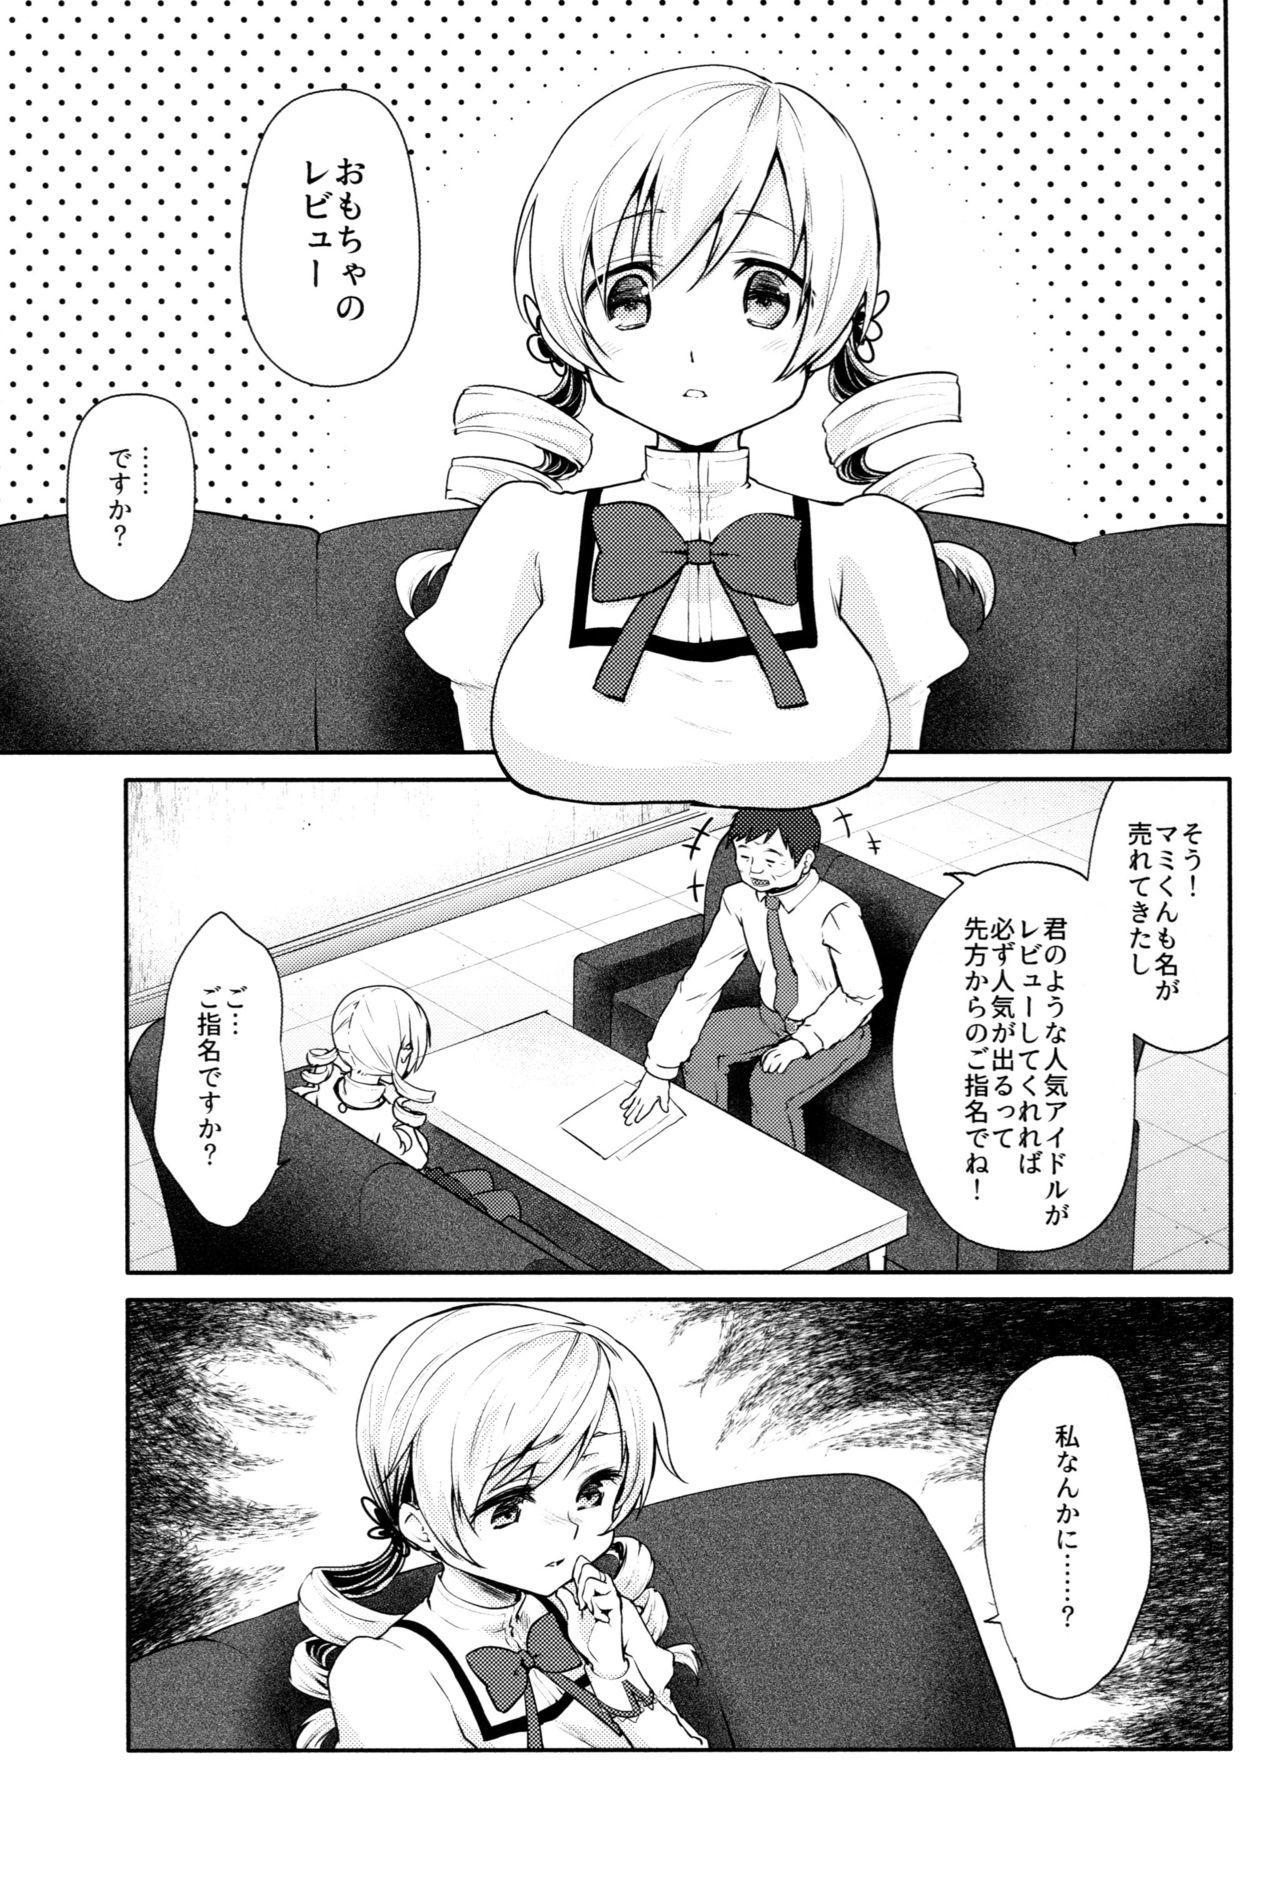 Tomoe Mami no Mankai Omocha Review 2